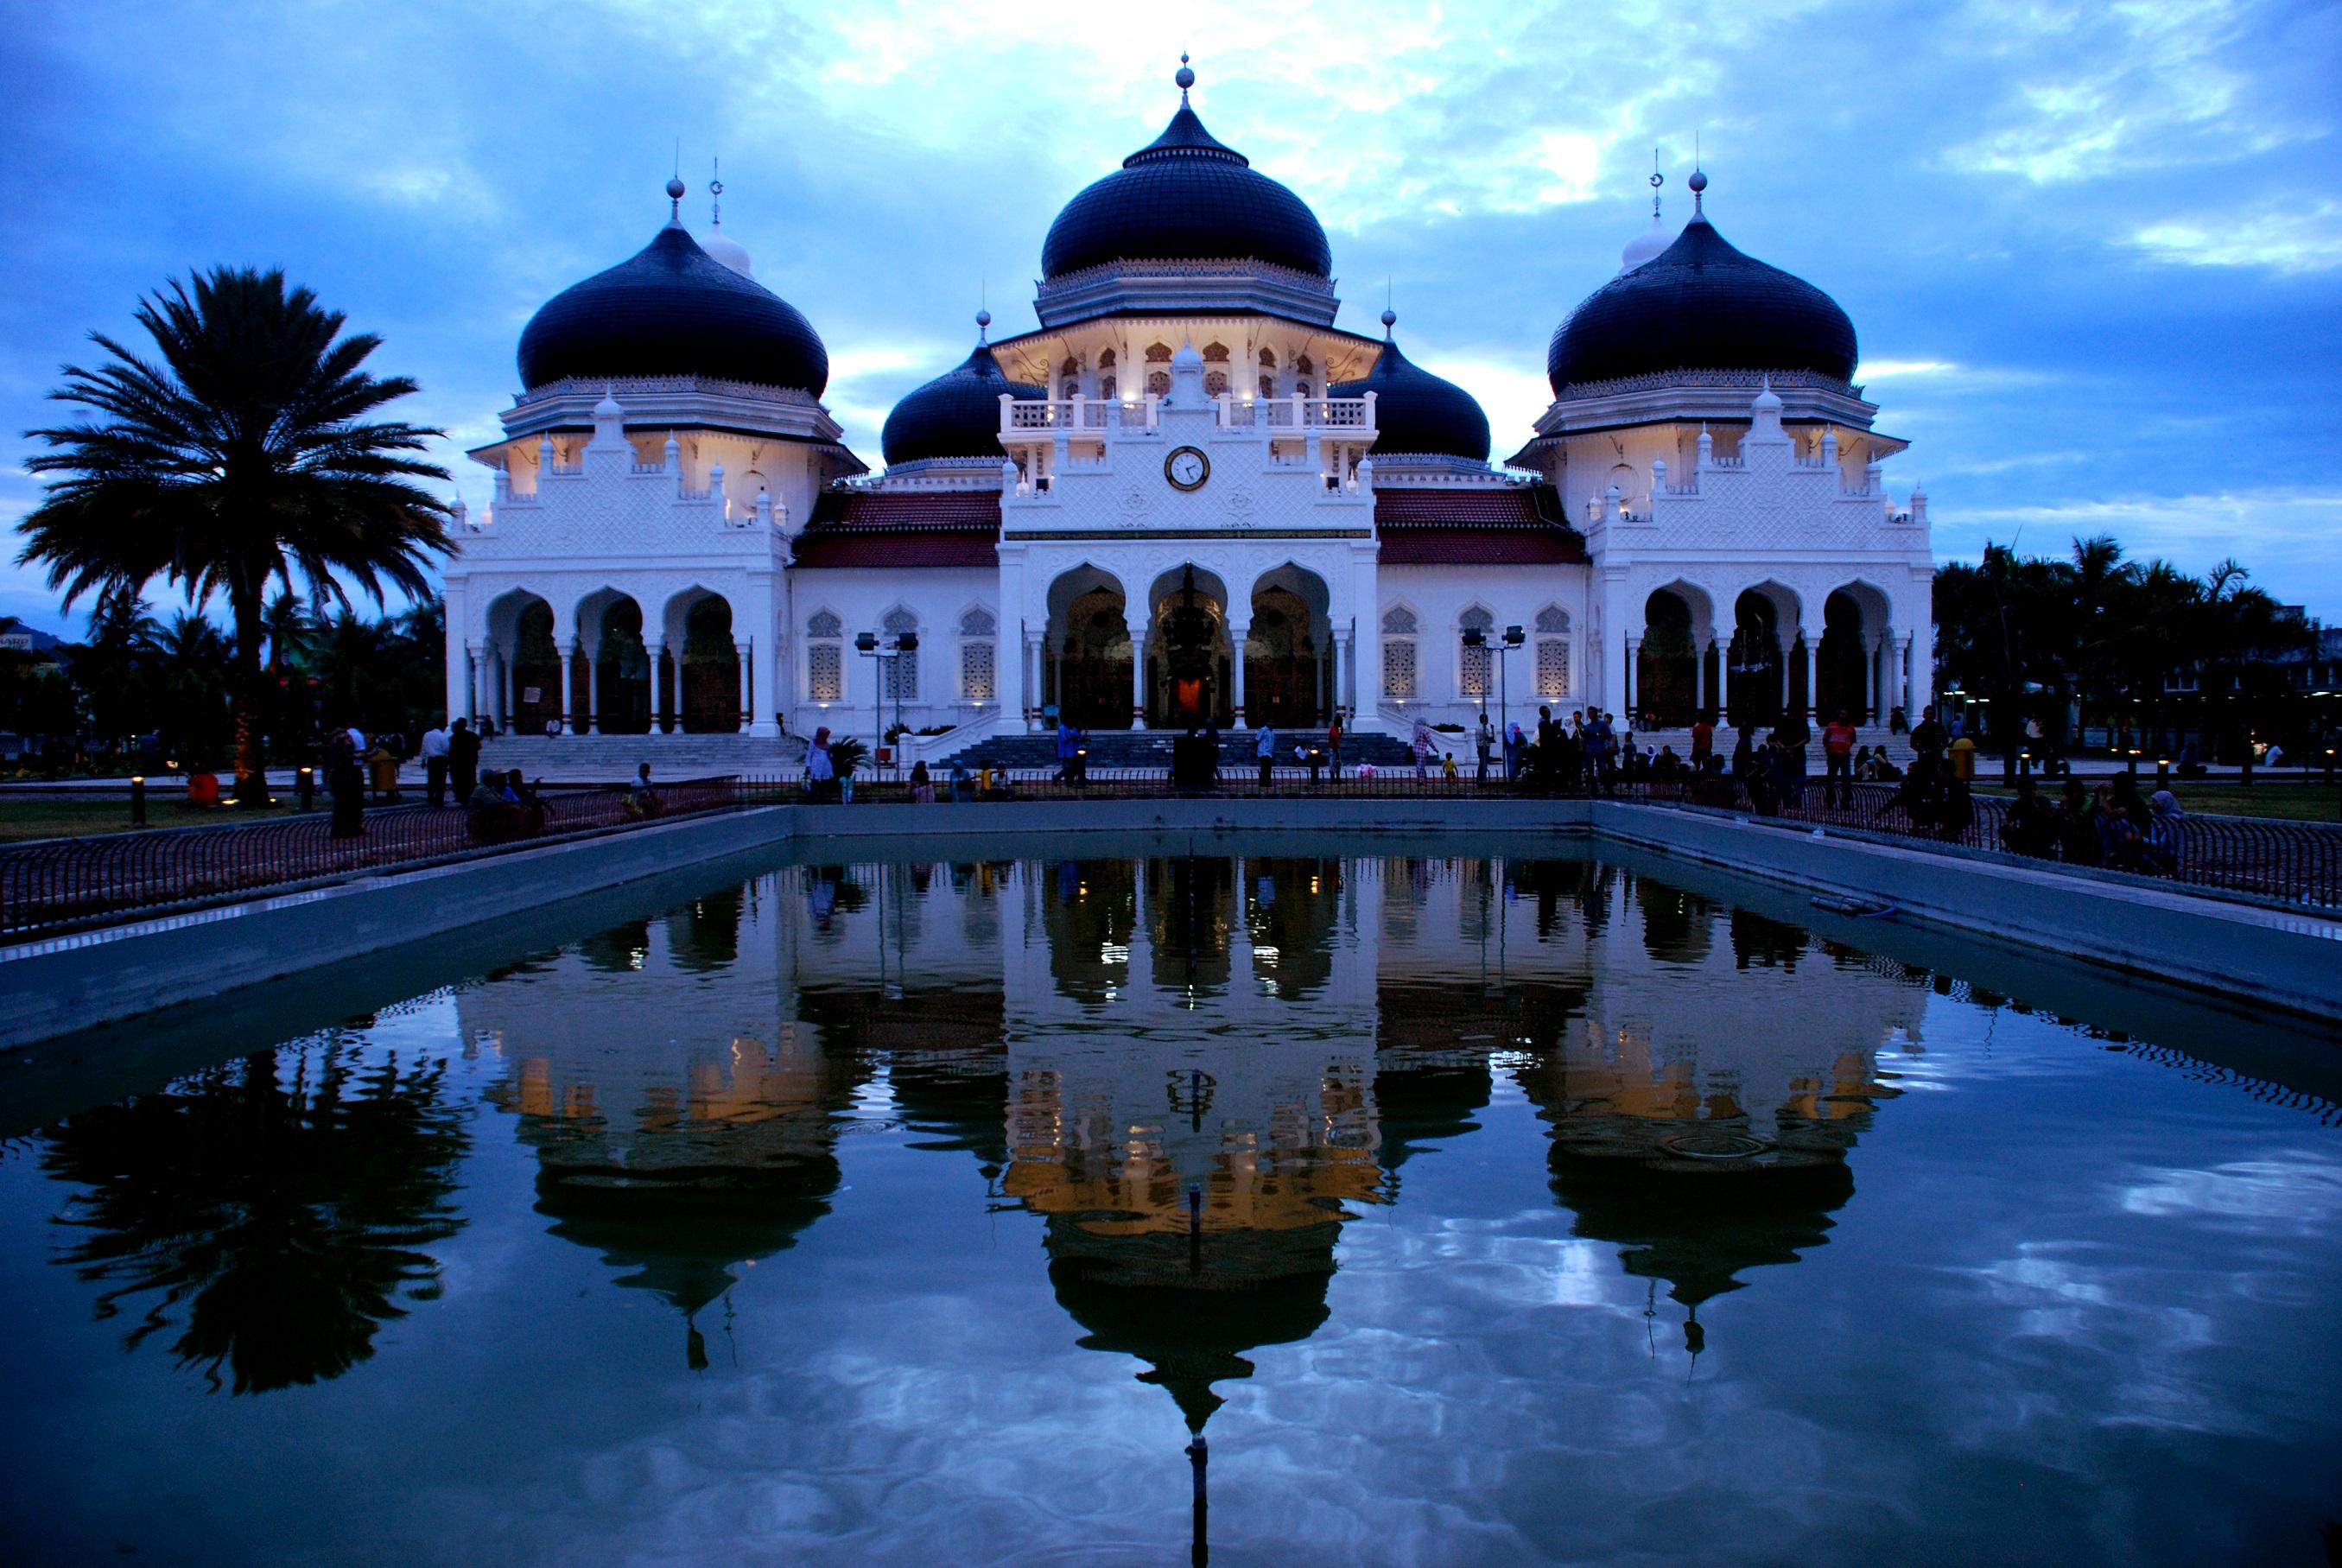 https://i0.wp.com/anekatempatwisata.com/wp-content/uploads/2014/09/Masjid-Raya-Baiturrahman.jpg